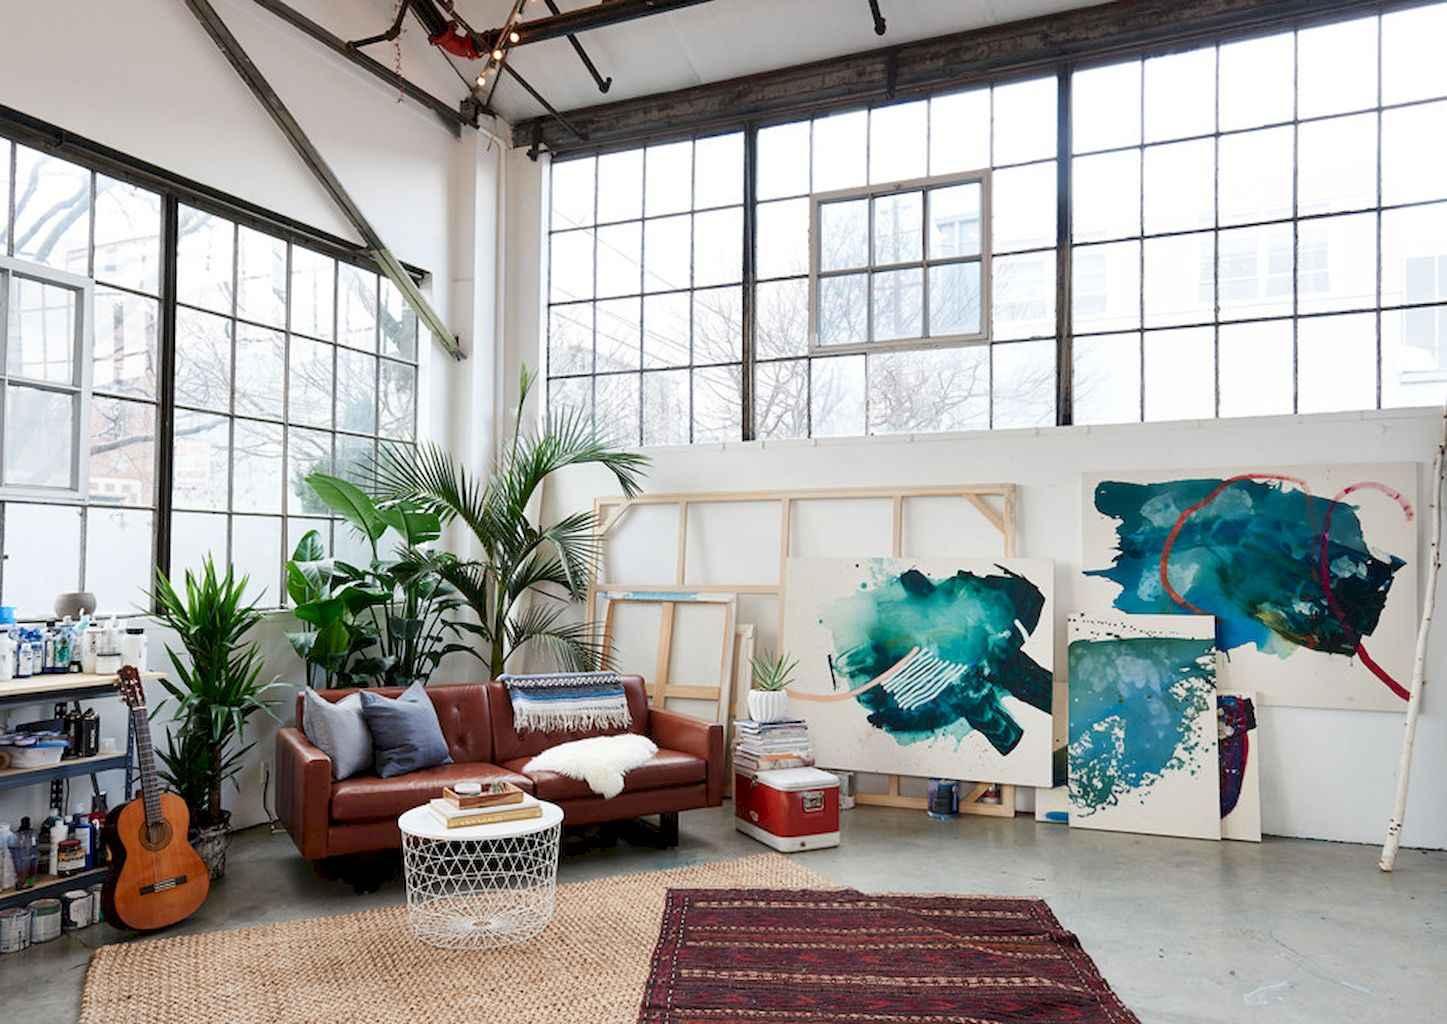 Cool creative loft apartment decorating ideas (10)